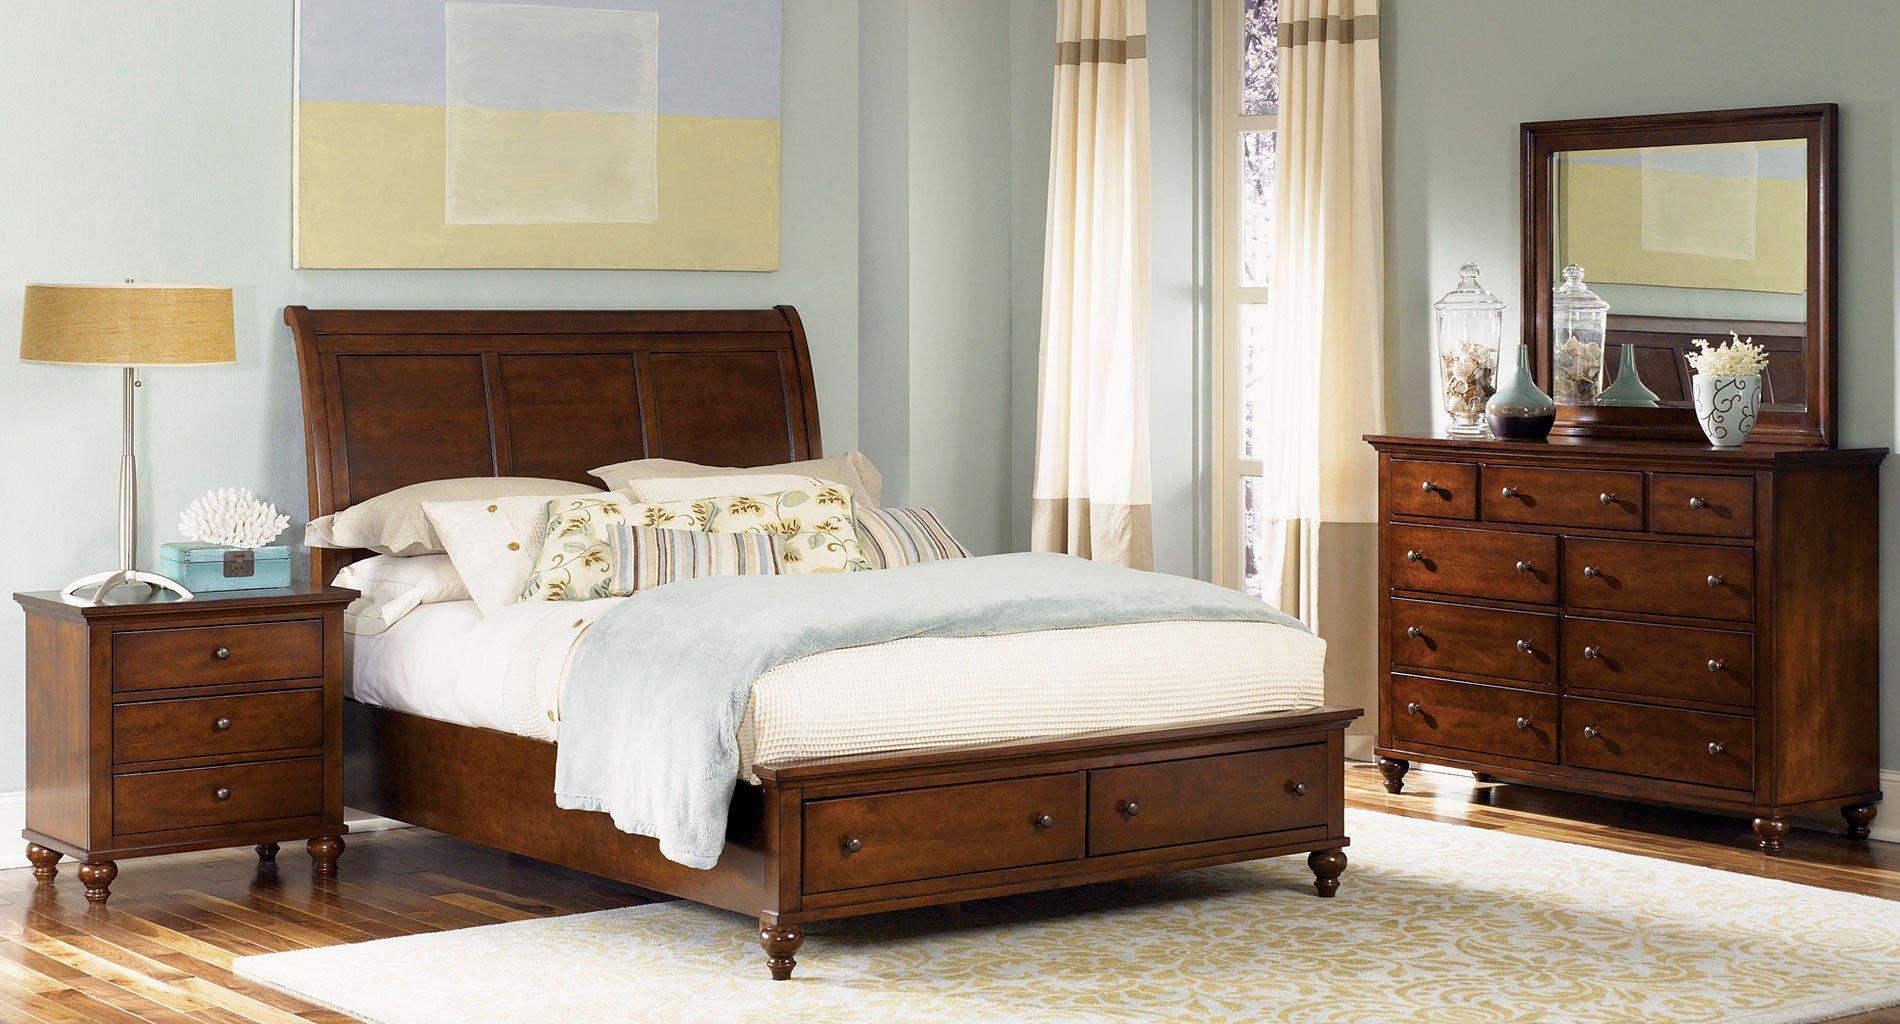 Hamilton queen storage bedroom set liberty furniture furniture cart for Queen bedroom furniture sets with storage